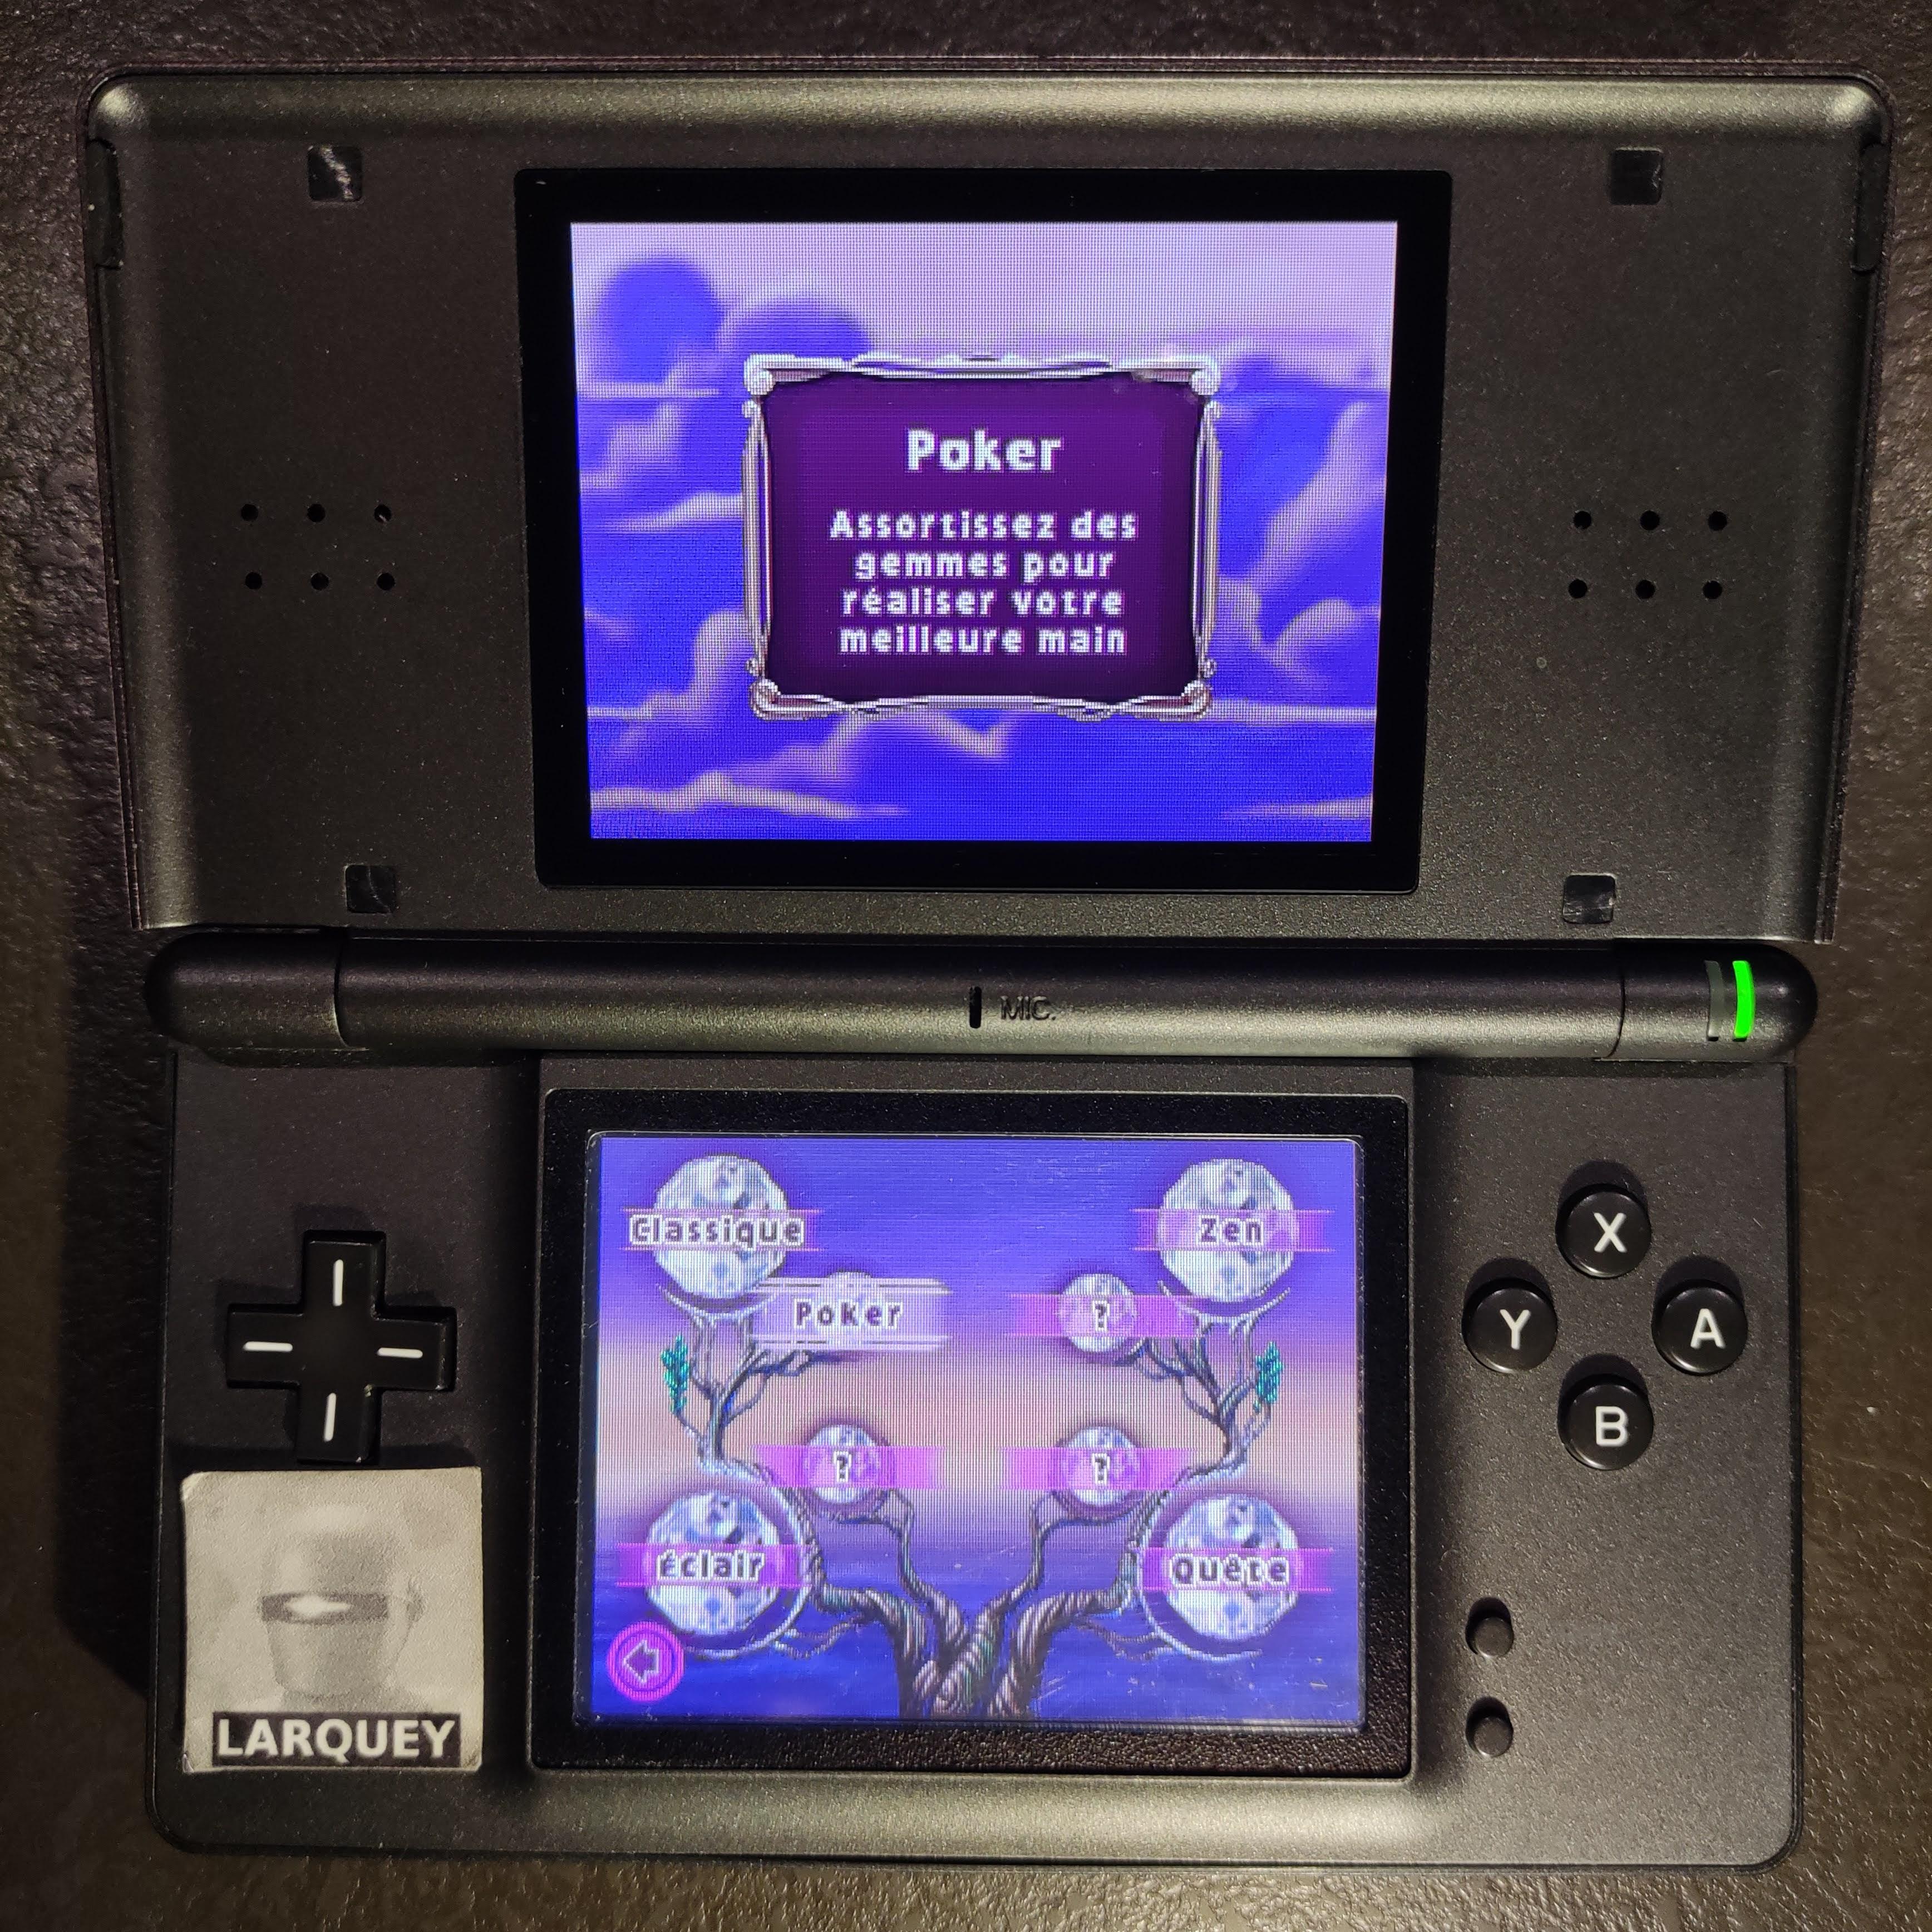 Larquey: Bejeweled 3: Poker [Number of Flush] (Nintendo DS) 0 points on 2020-09-26 04:28:01